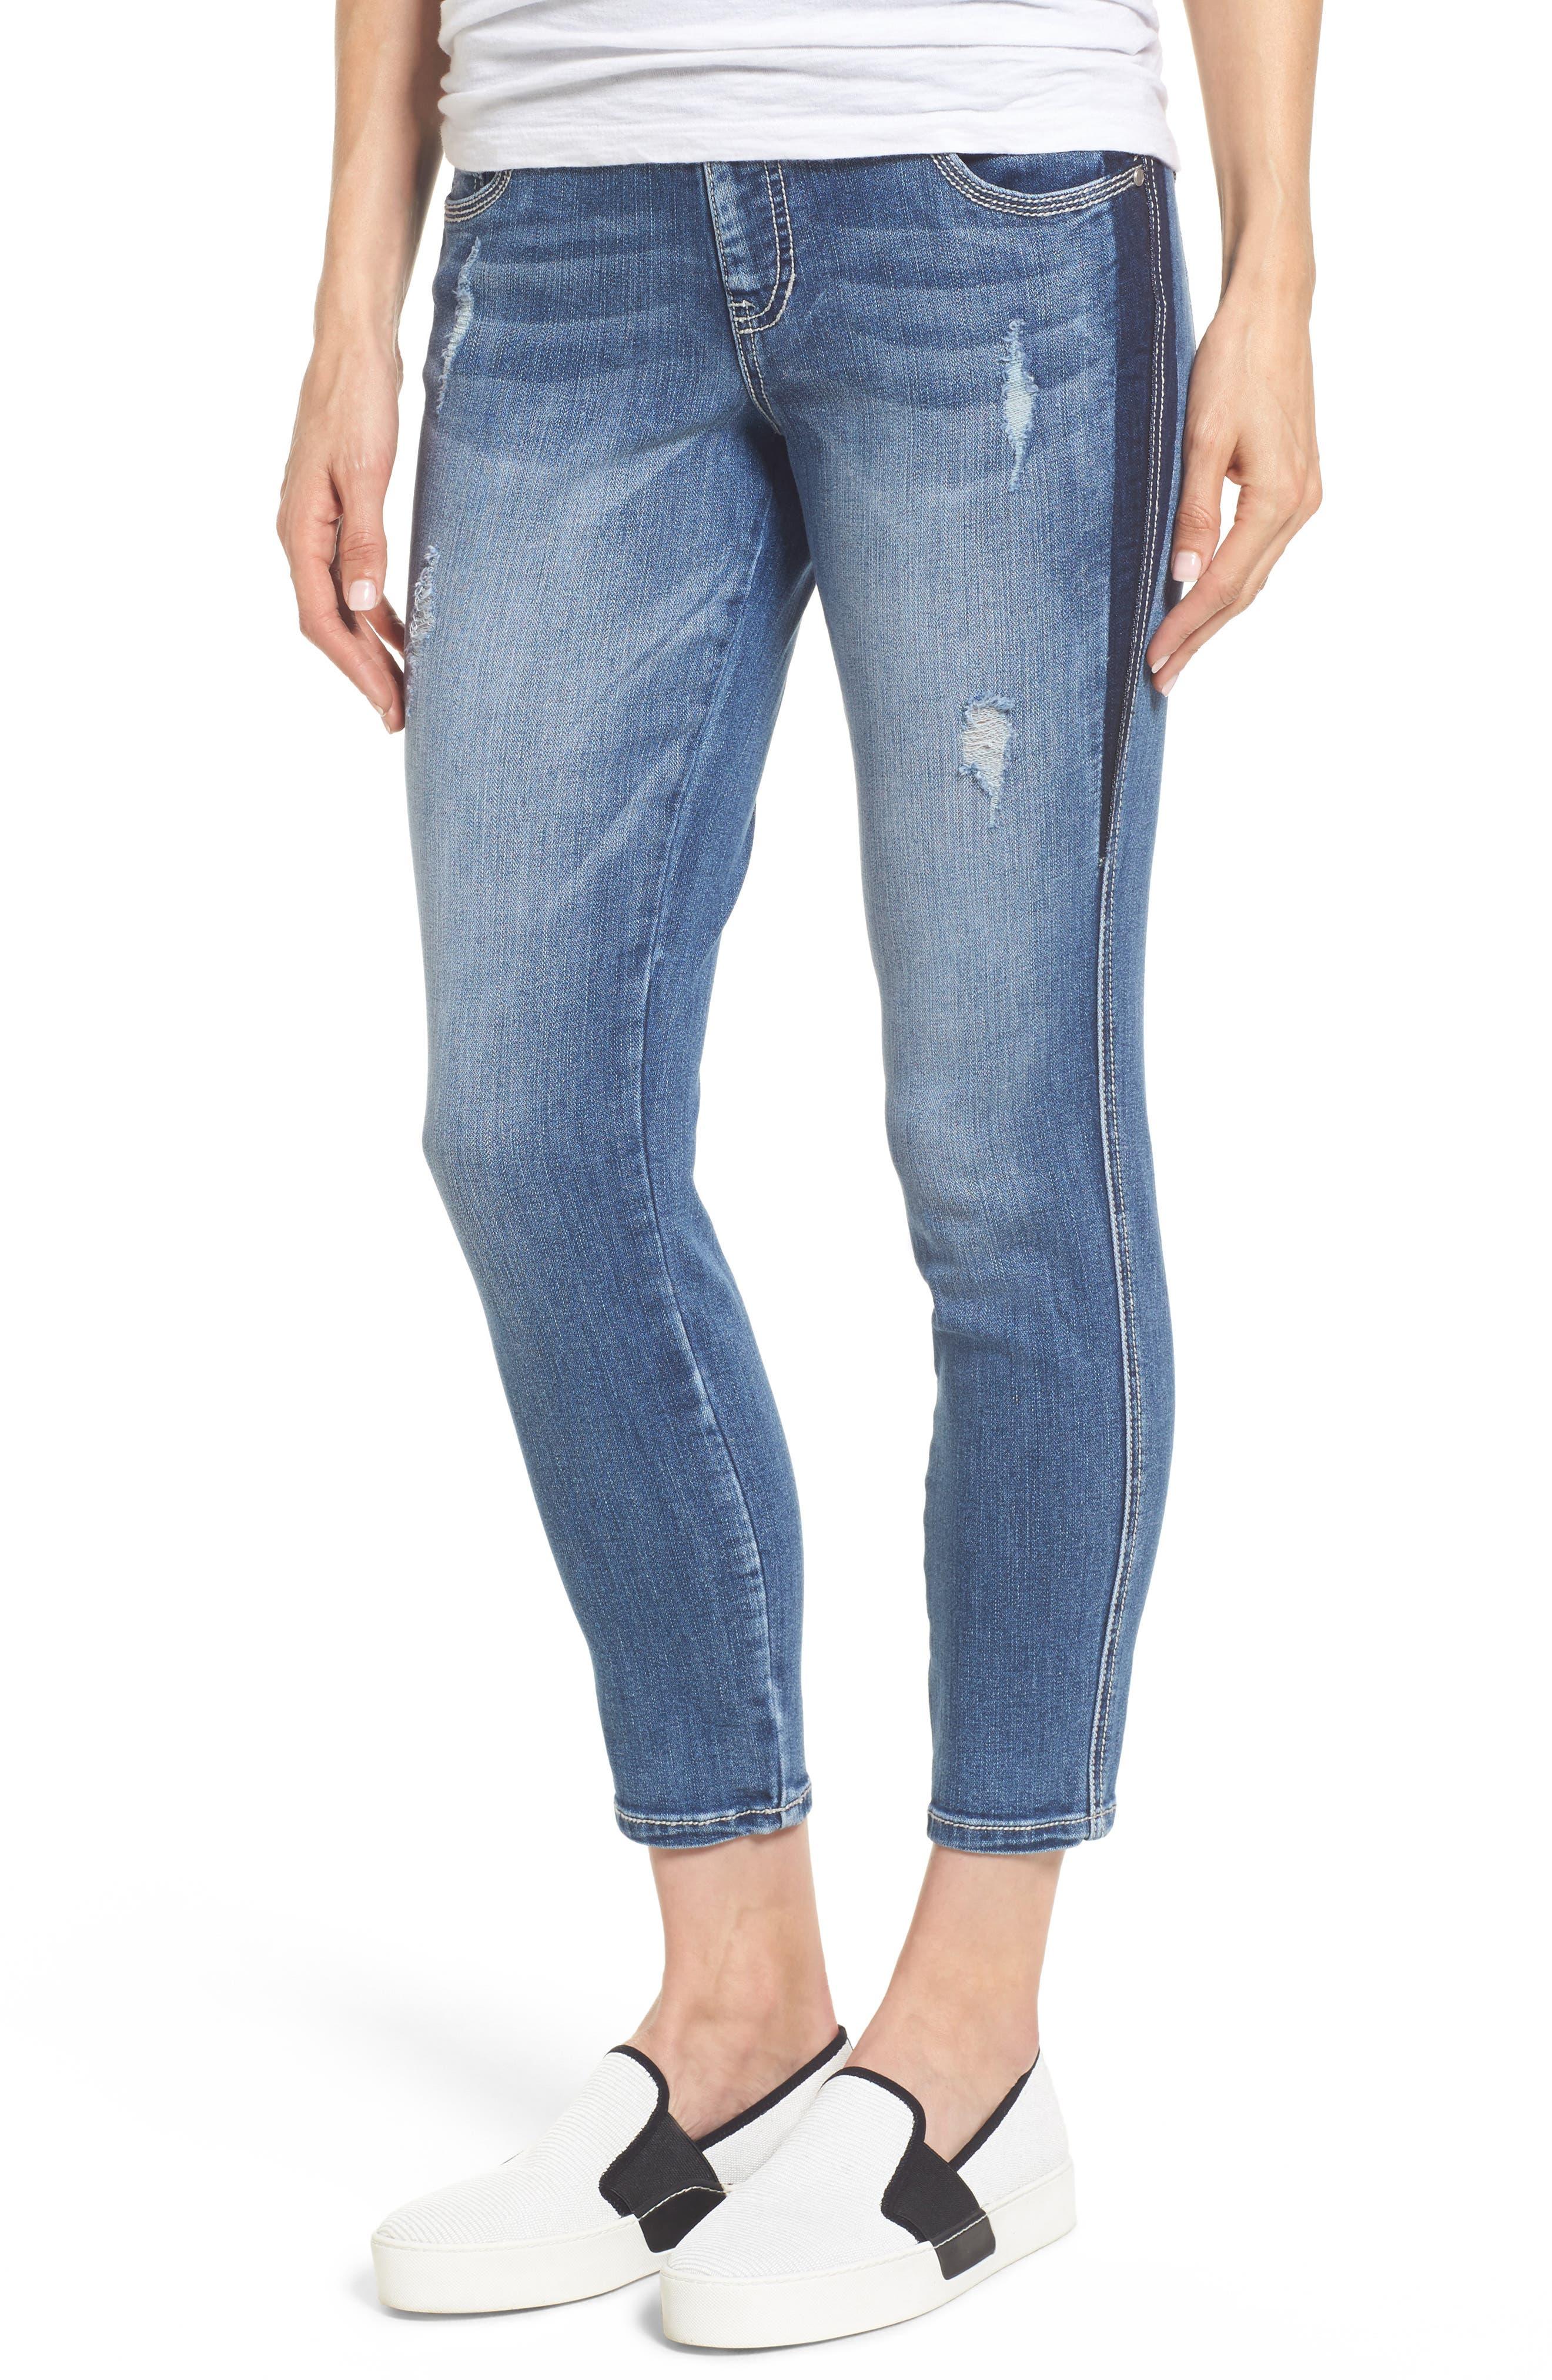 Nora Marta Stretch Skinny Jeans,                         Main,                         color, 420